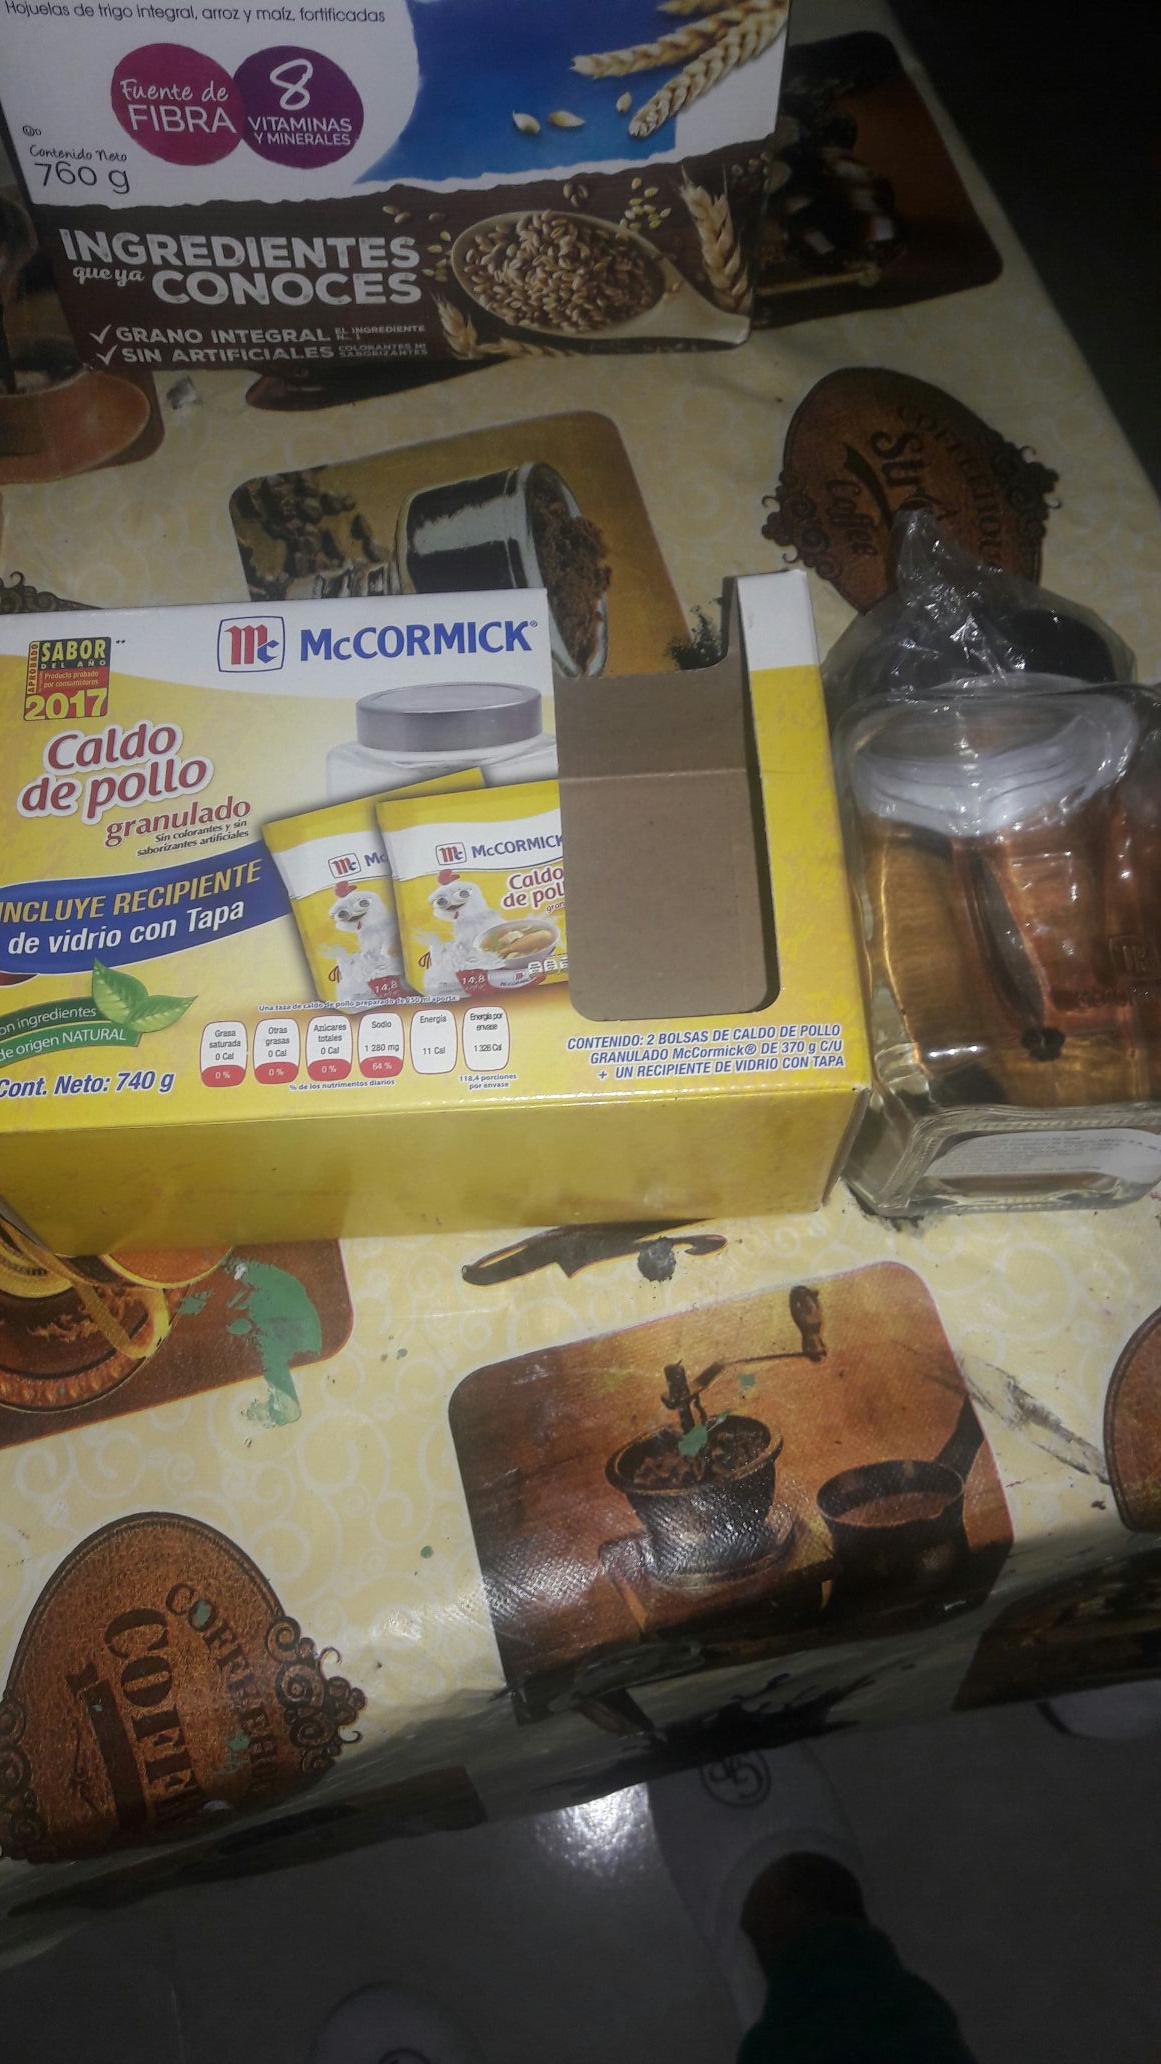 Bodega Aurrerá: caldo de pollo McMacormick 29.03 , 2 bolsas+ un recipiente de vidrio